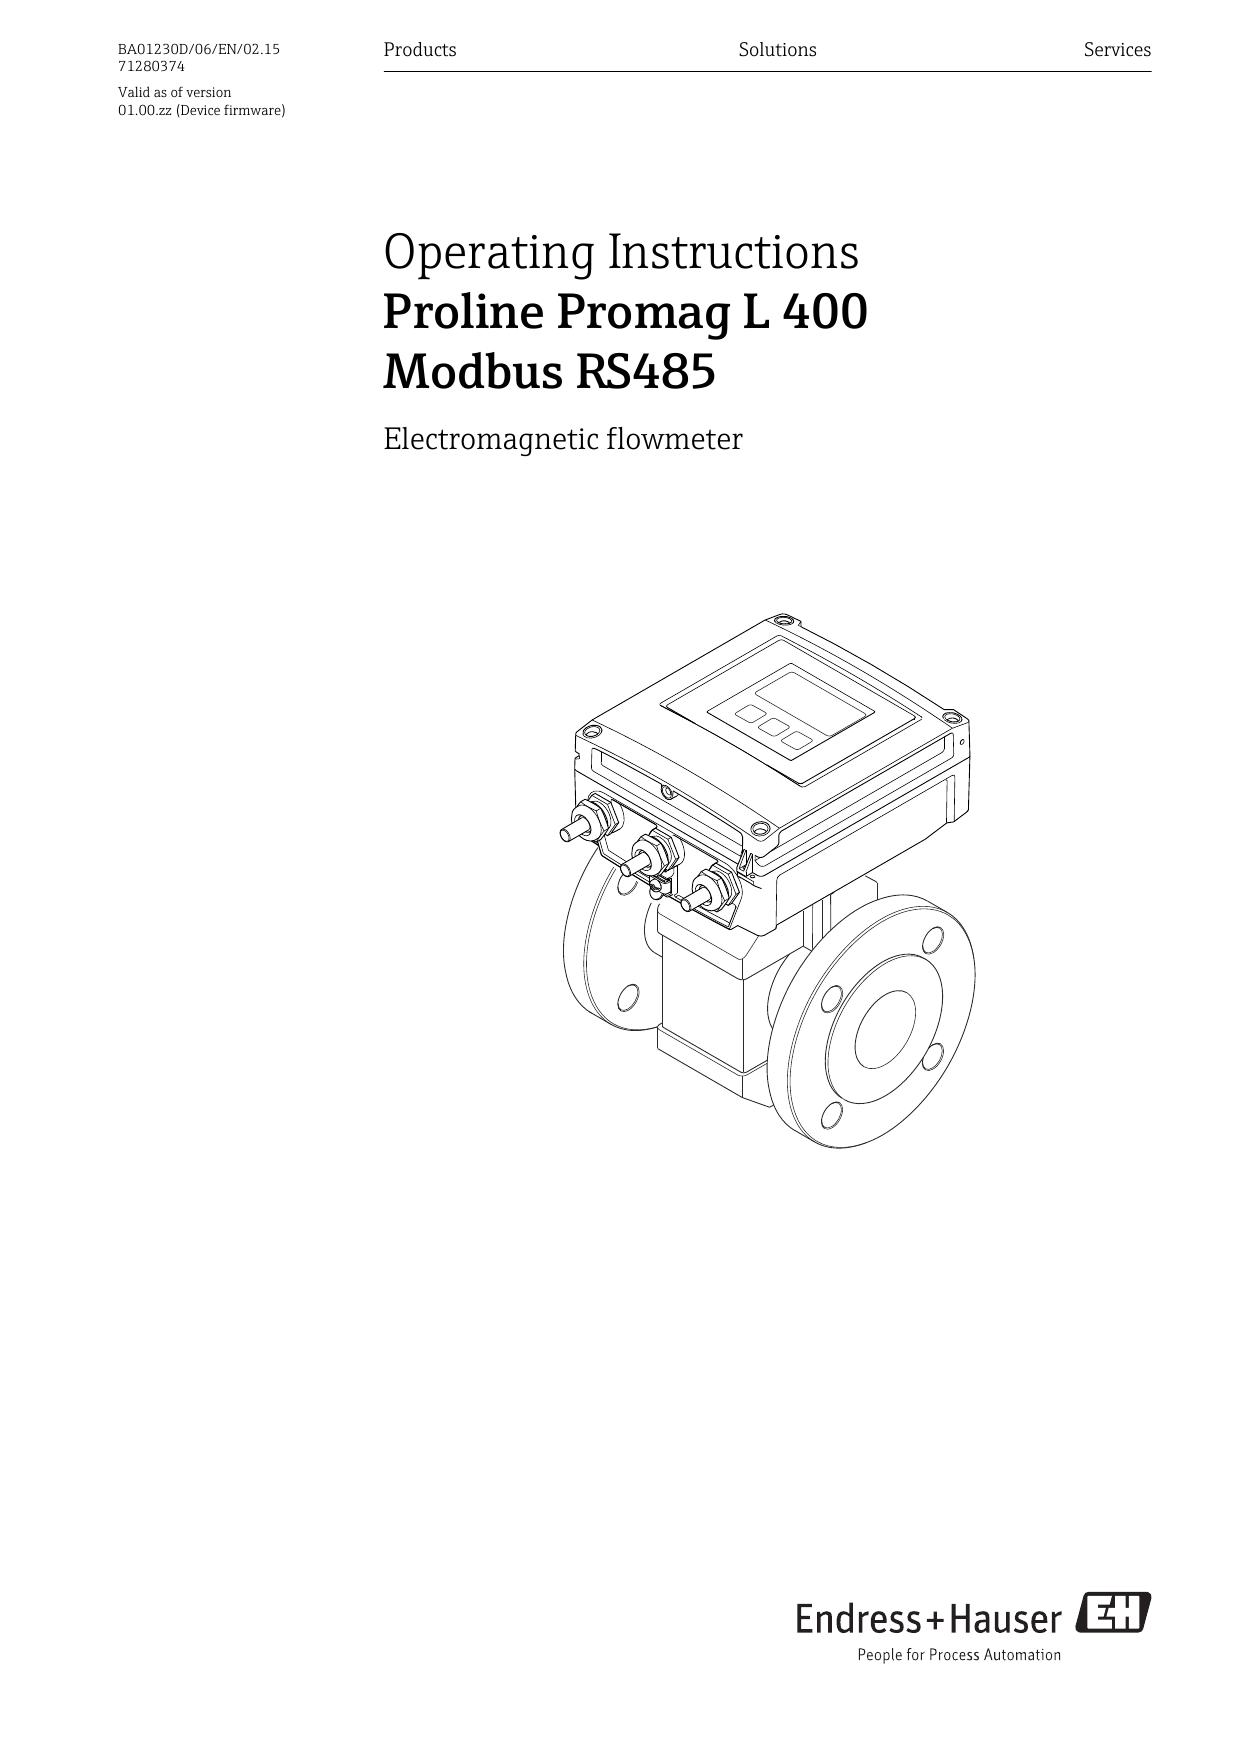 Proline Promag L 400 Modbus RS485 | manualzz com